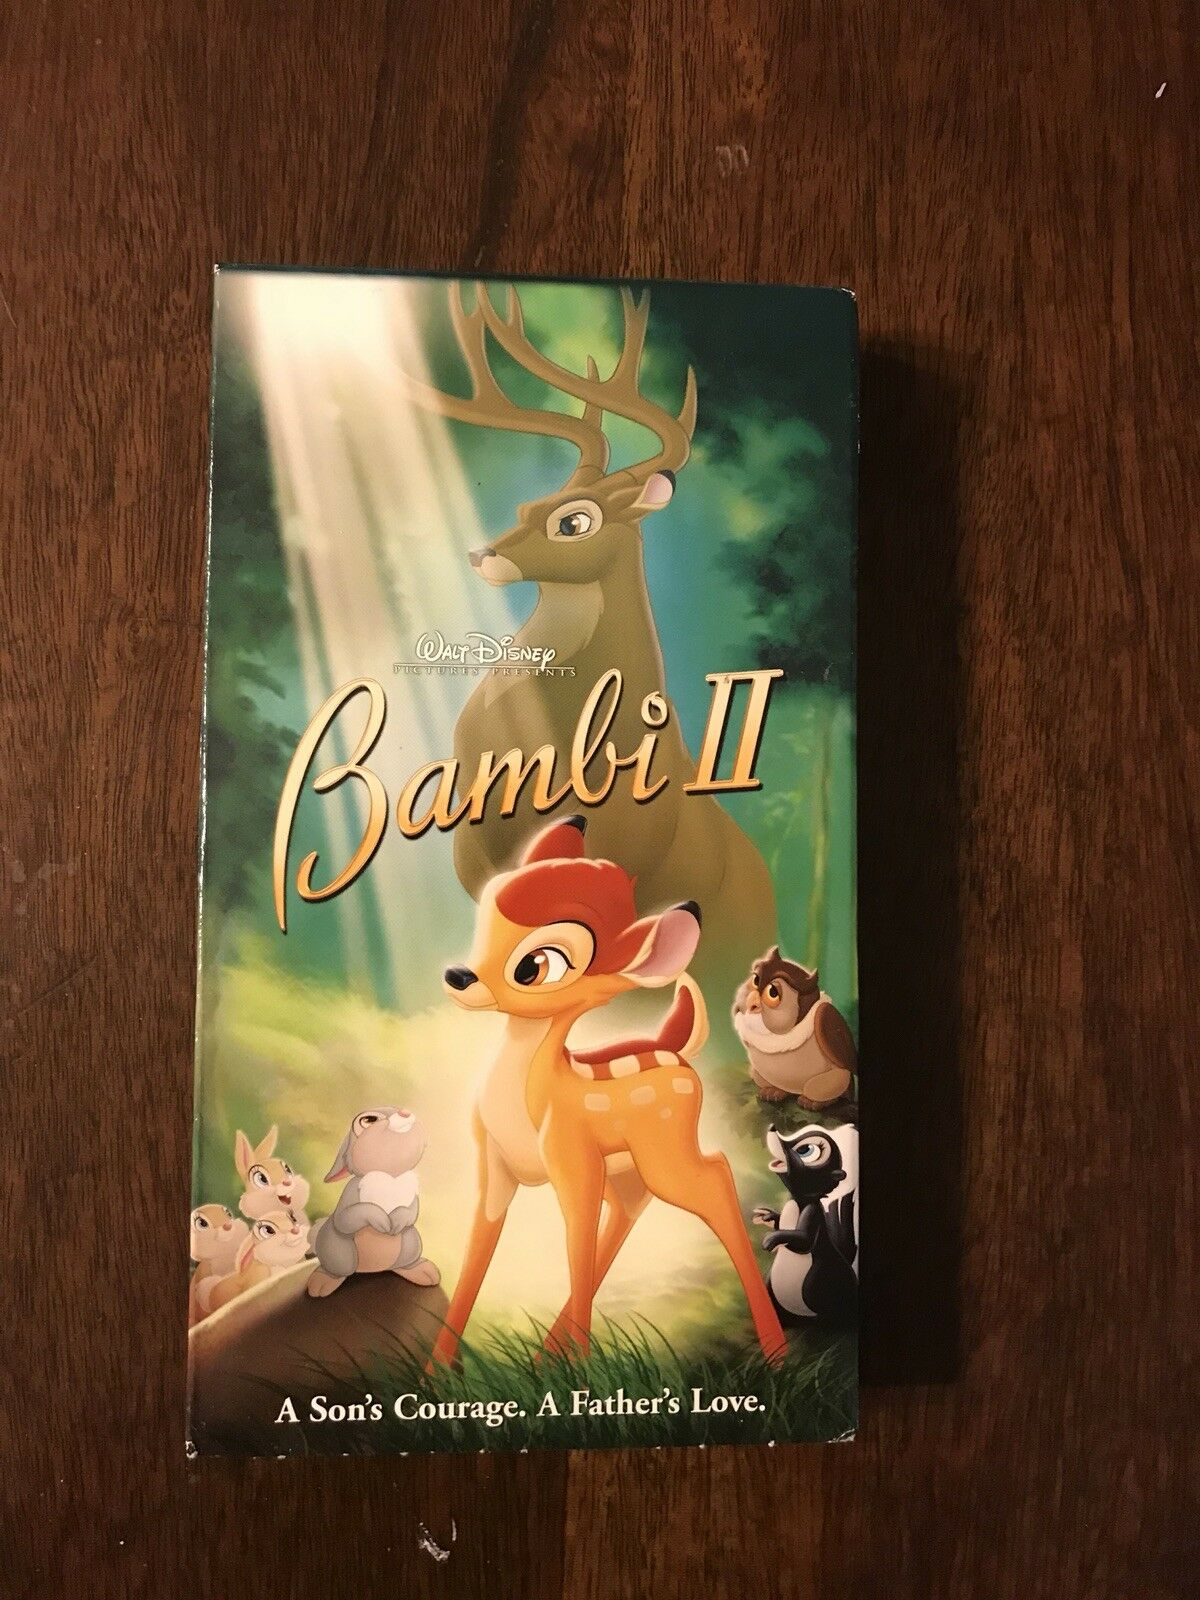 Bambi II (2006 DVD/VHS)